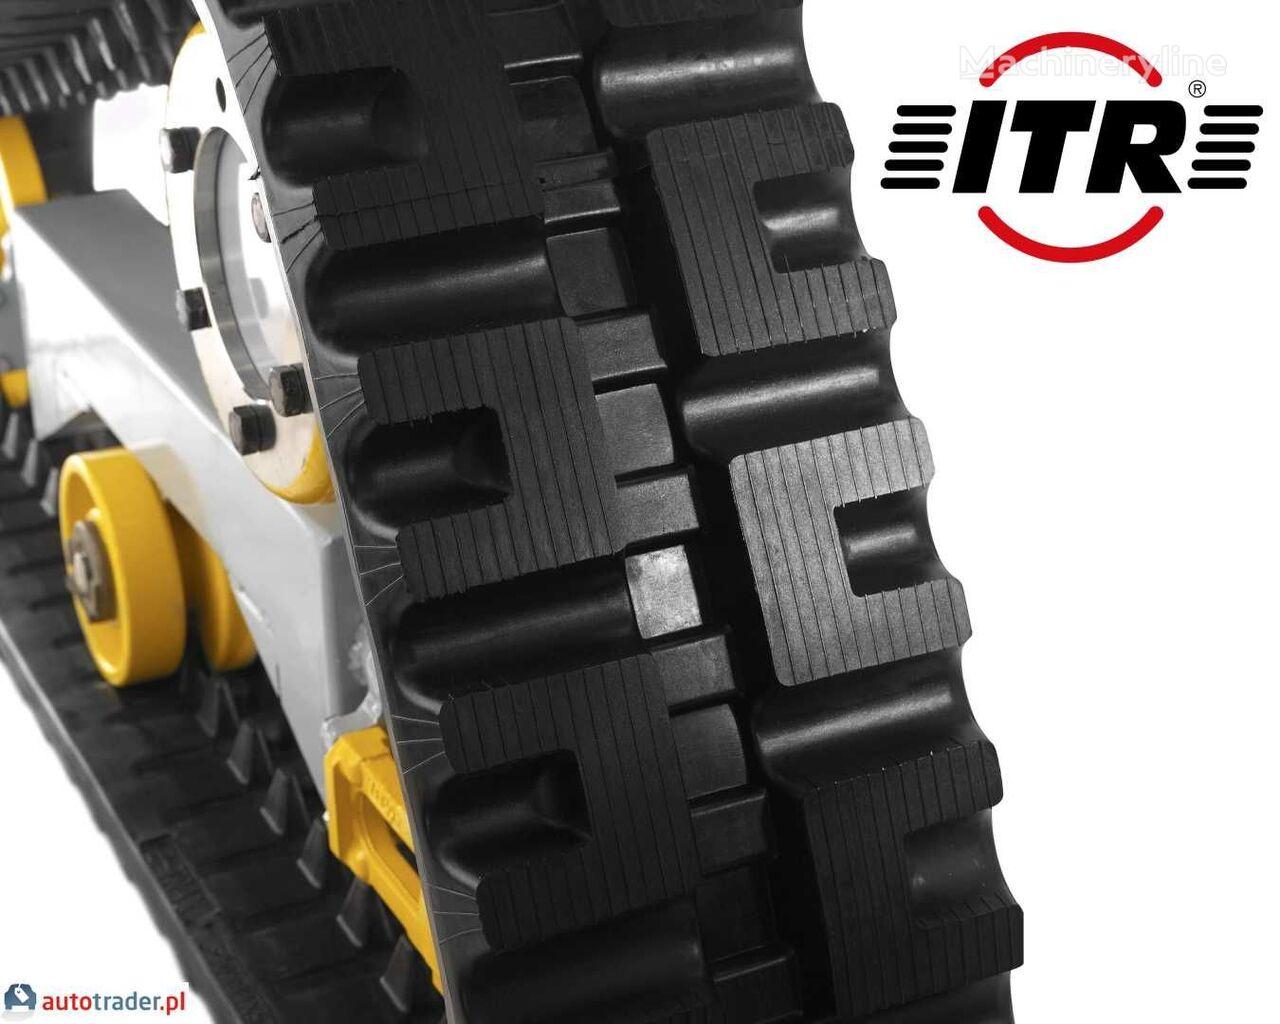 Rupsen voor ITR PEL JOB LS406 2016r ITR minigraver